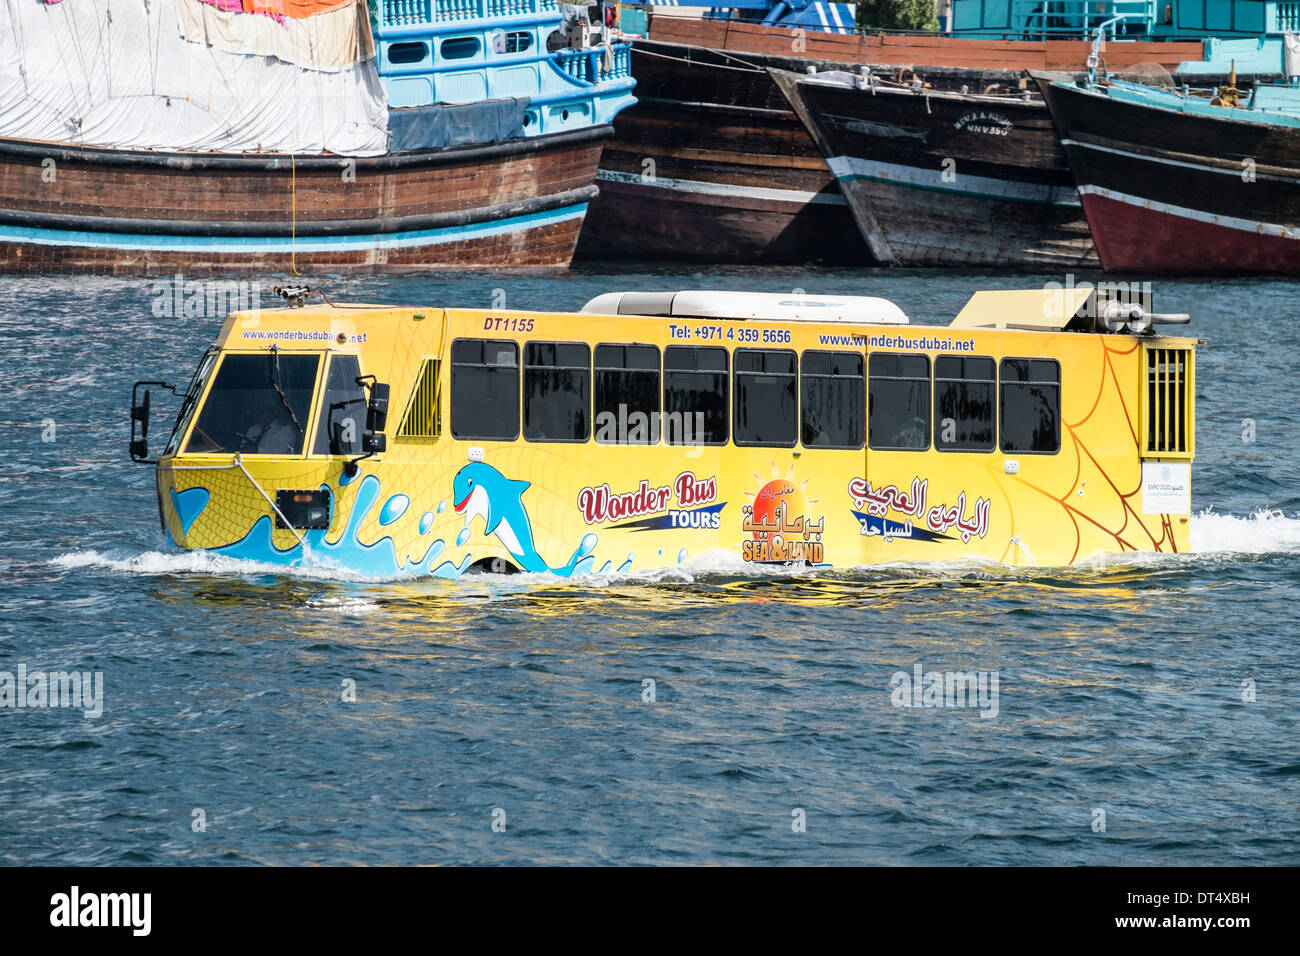 Wonder Bus tourist water tour bus on The Creek river in Dubai United Arab Emirates UAE - Stock Image